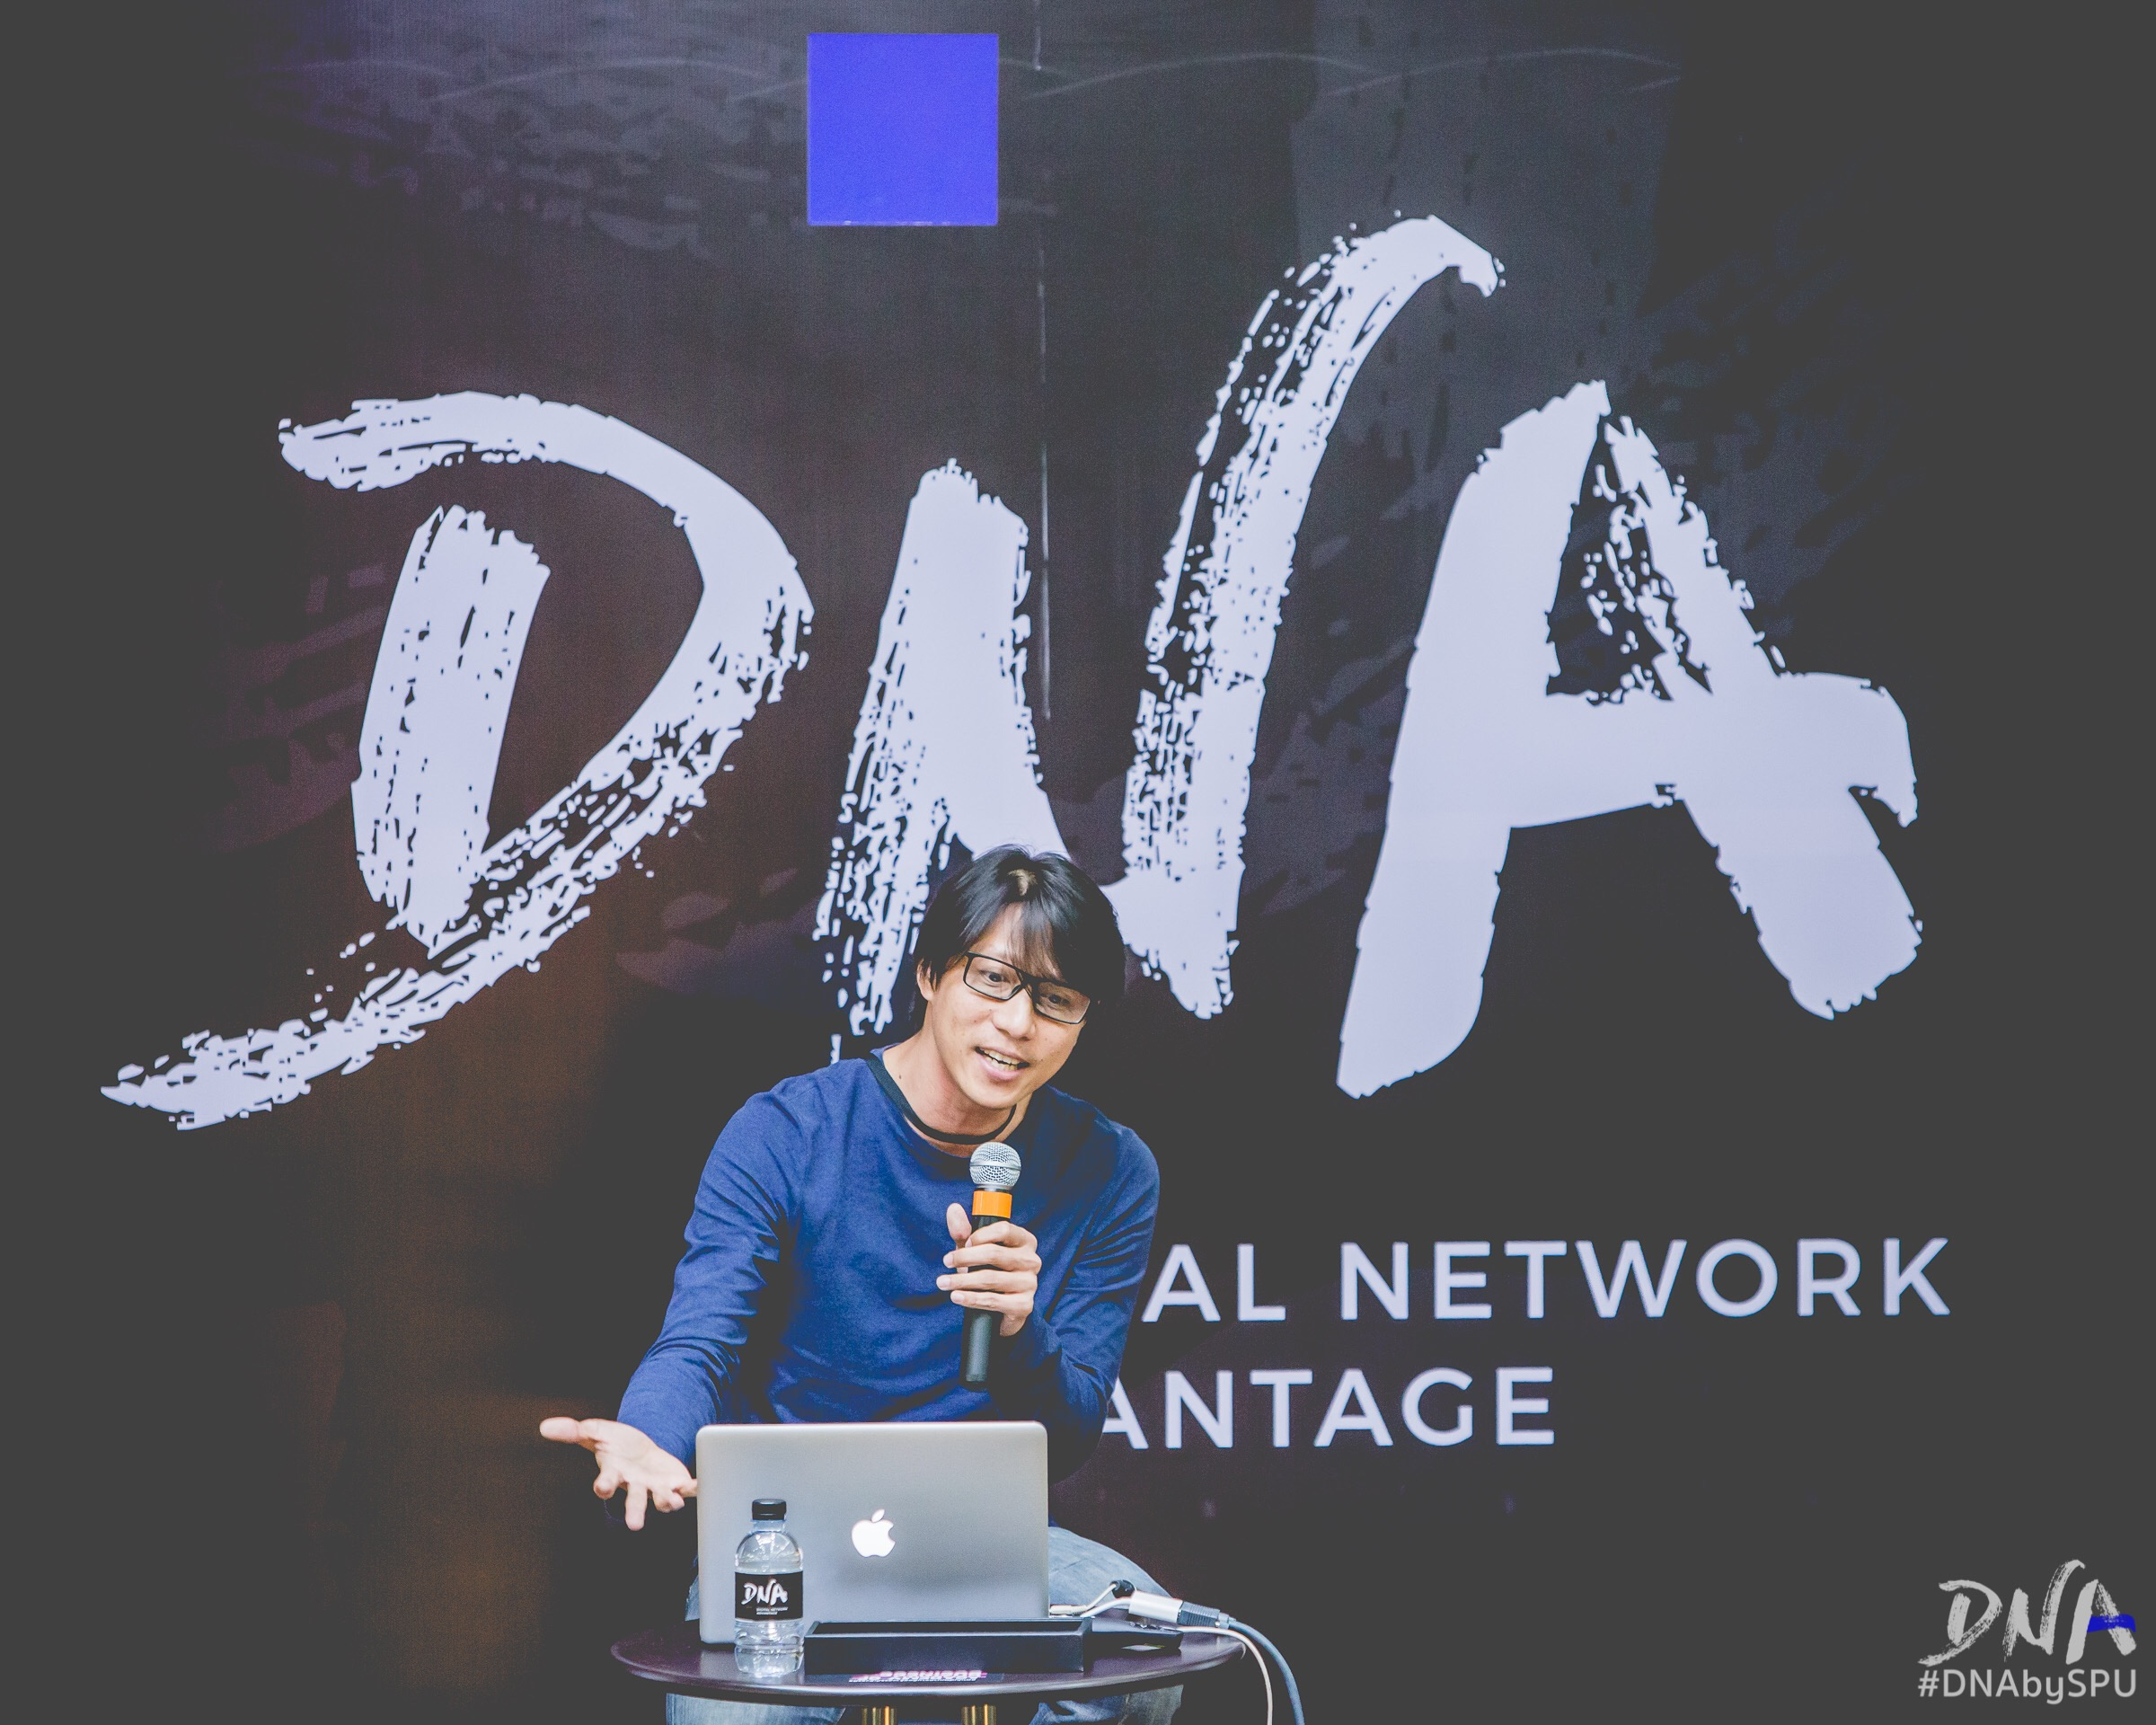 "#DNAjournal EP.13 #DNAbySPU [Learning from feeling :: เรียนรู้... จาก""มวลอารมณ์] คุณพล หุยประเสริฐ"